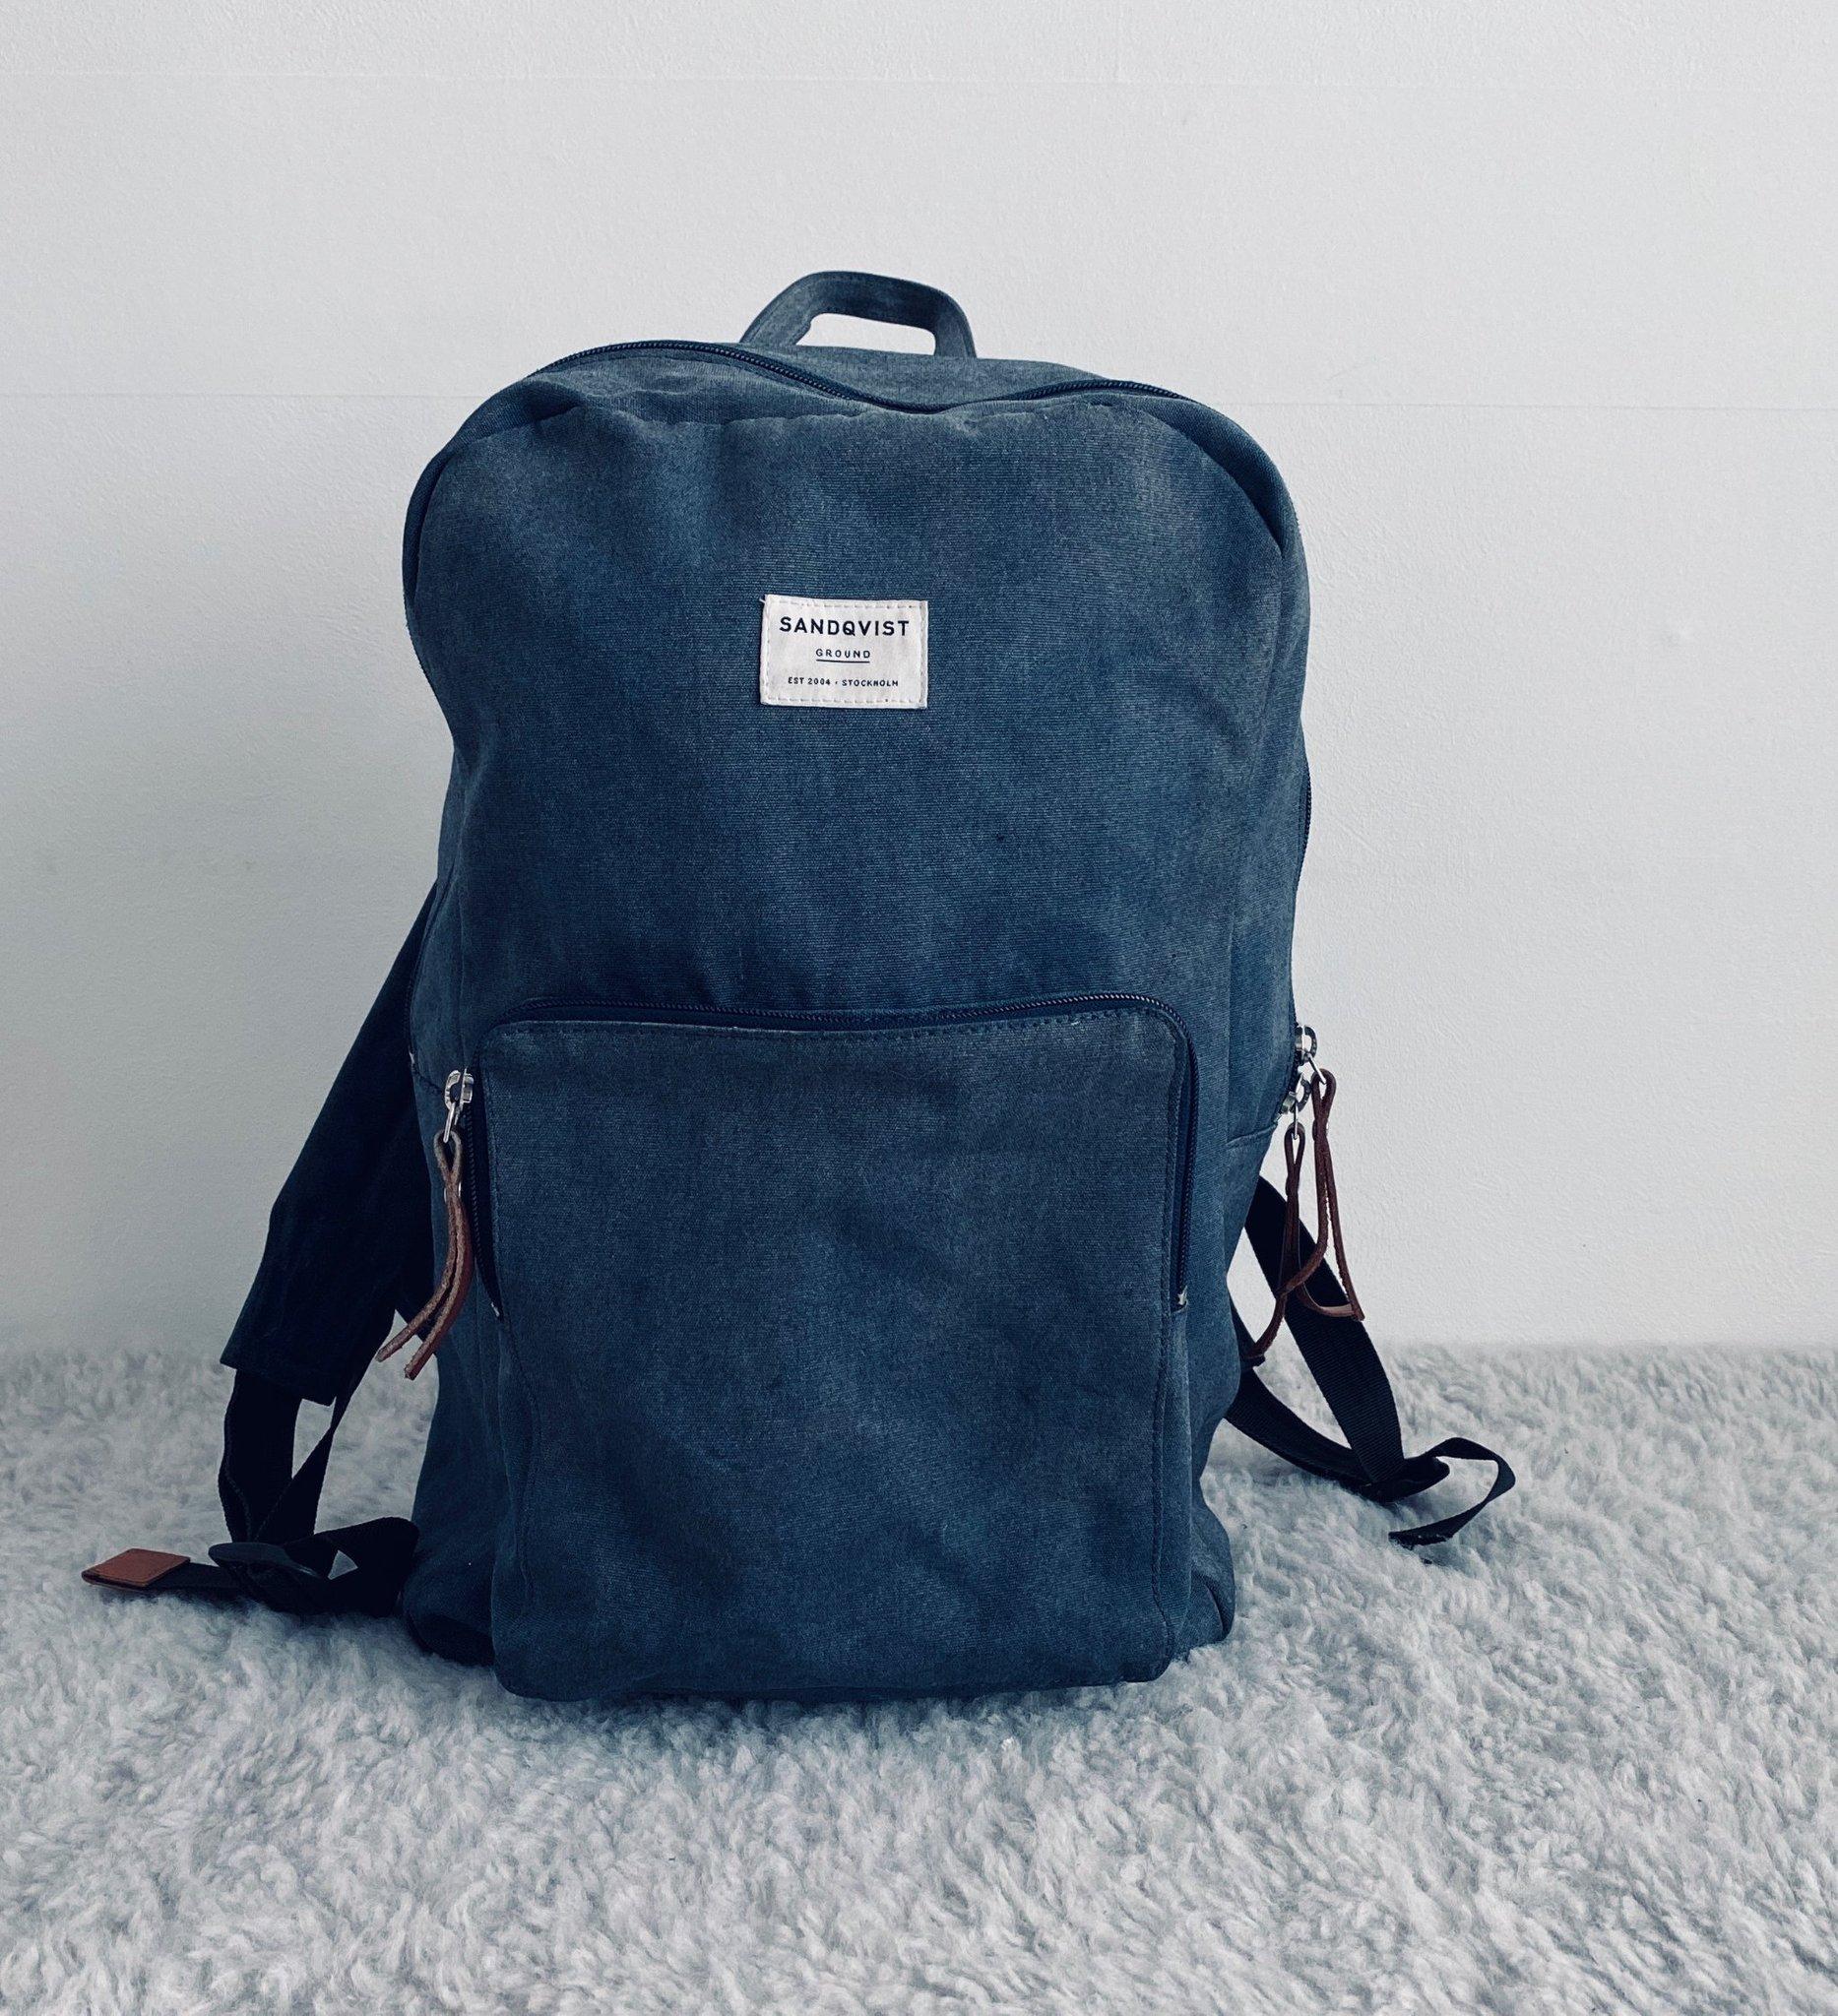 sandqvist väska stig cdon